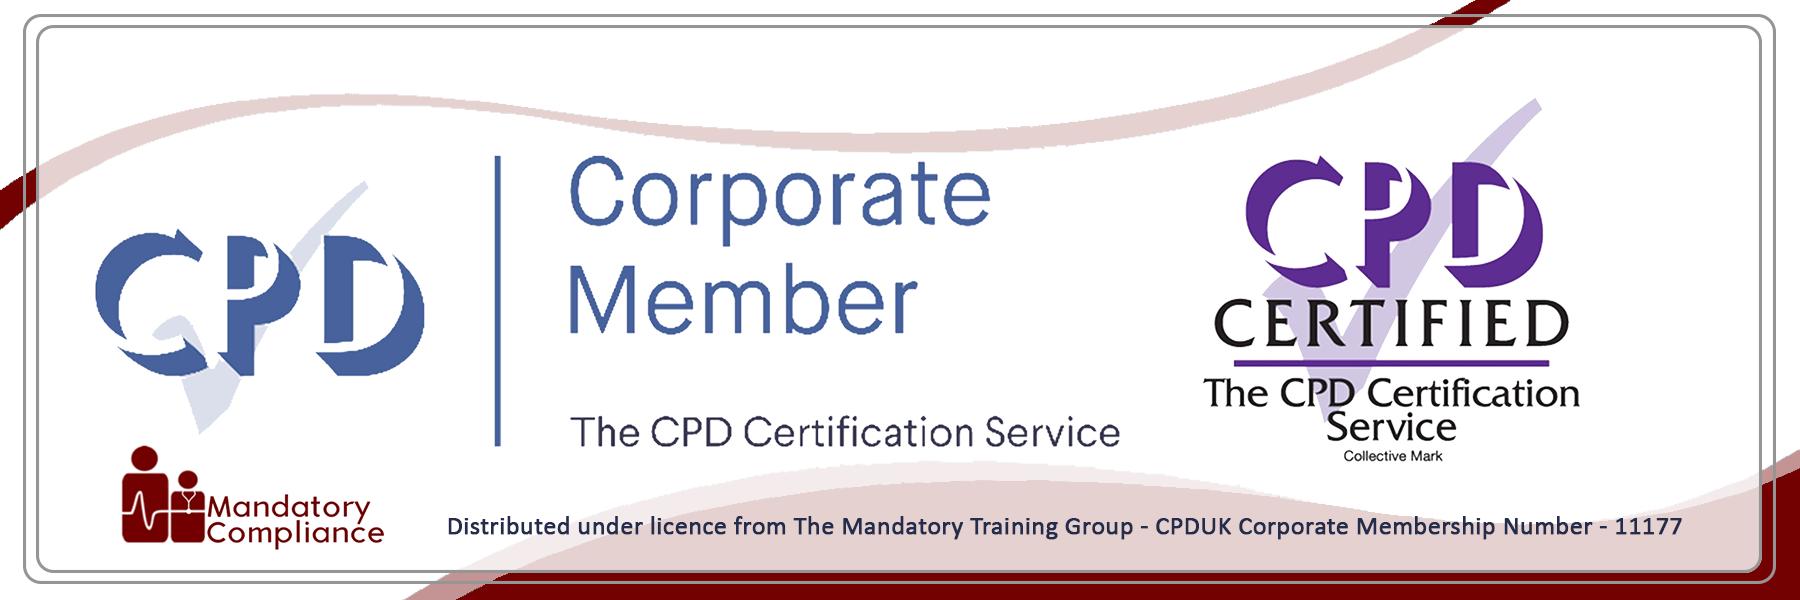 Dual Diagnosis - Online Training Courses - Mandatory Compliance UK-